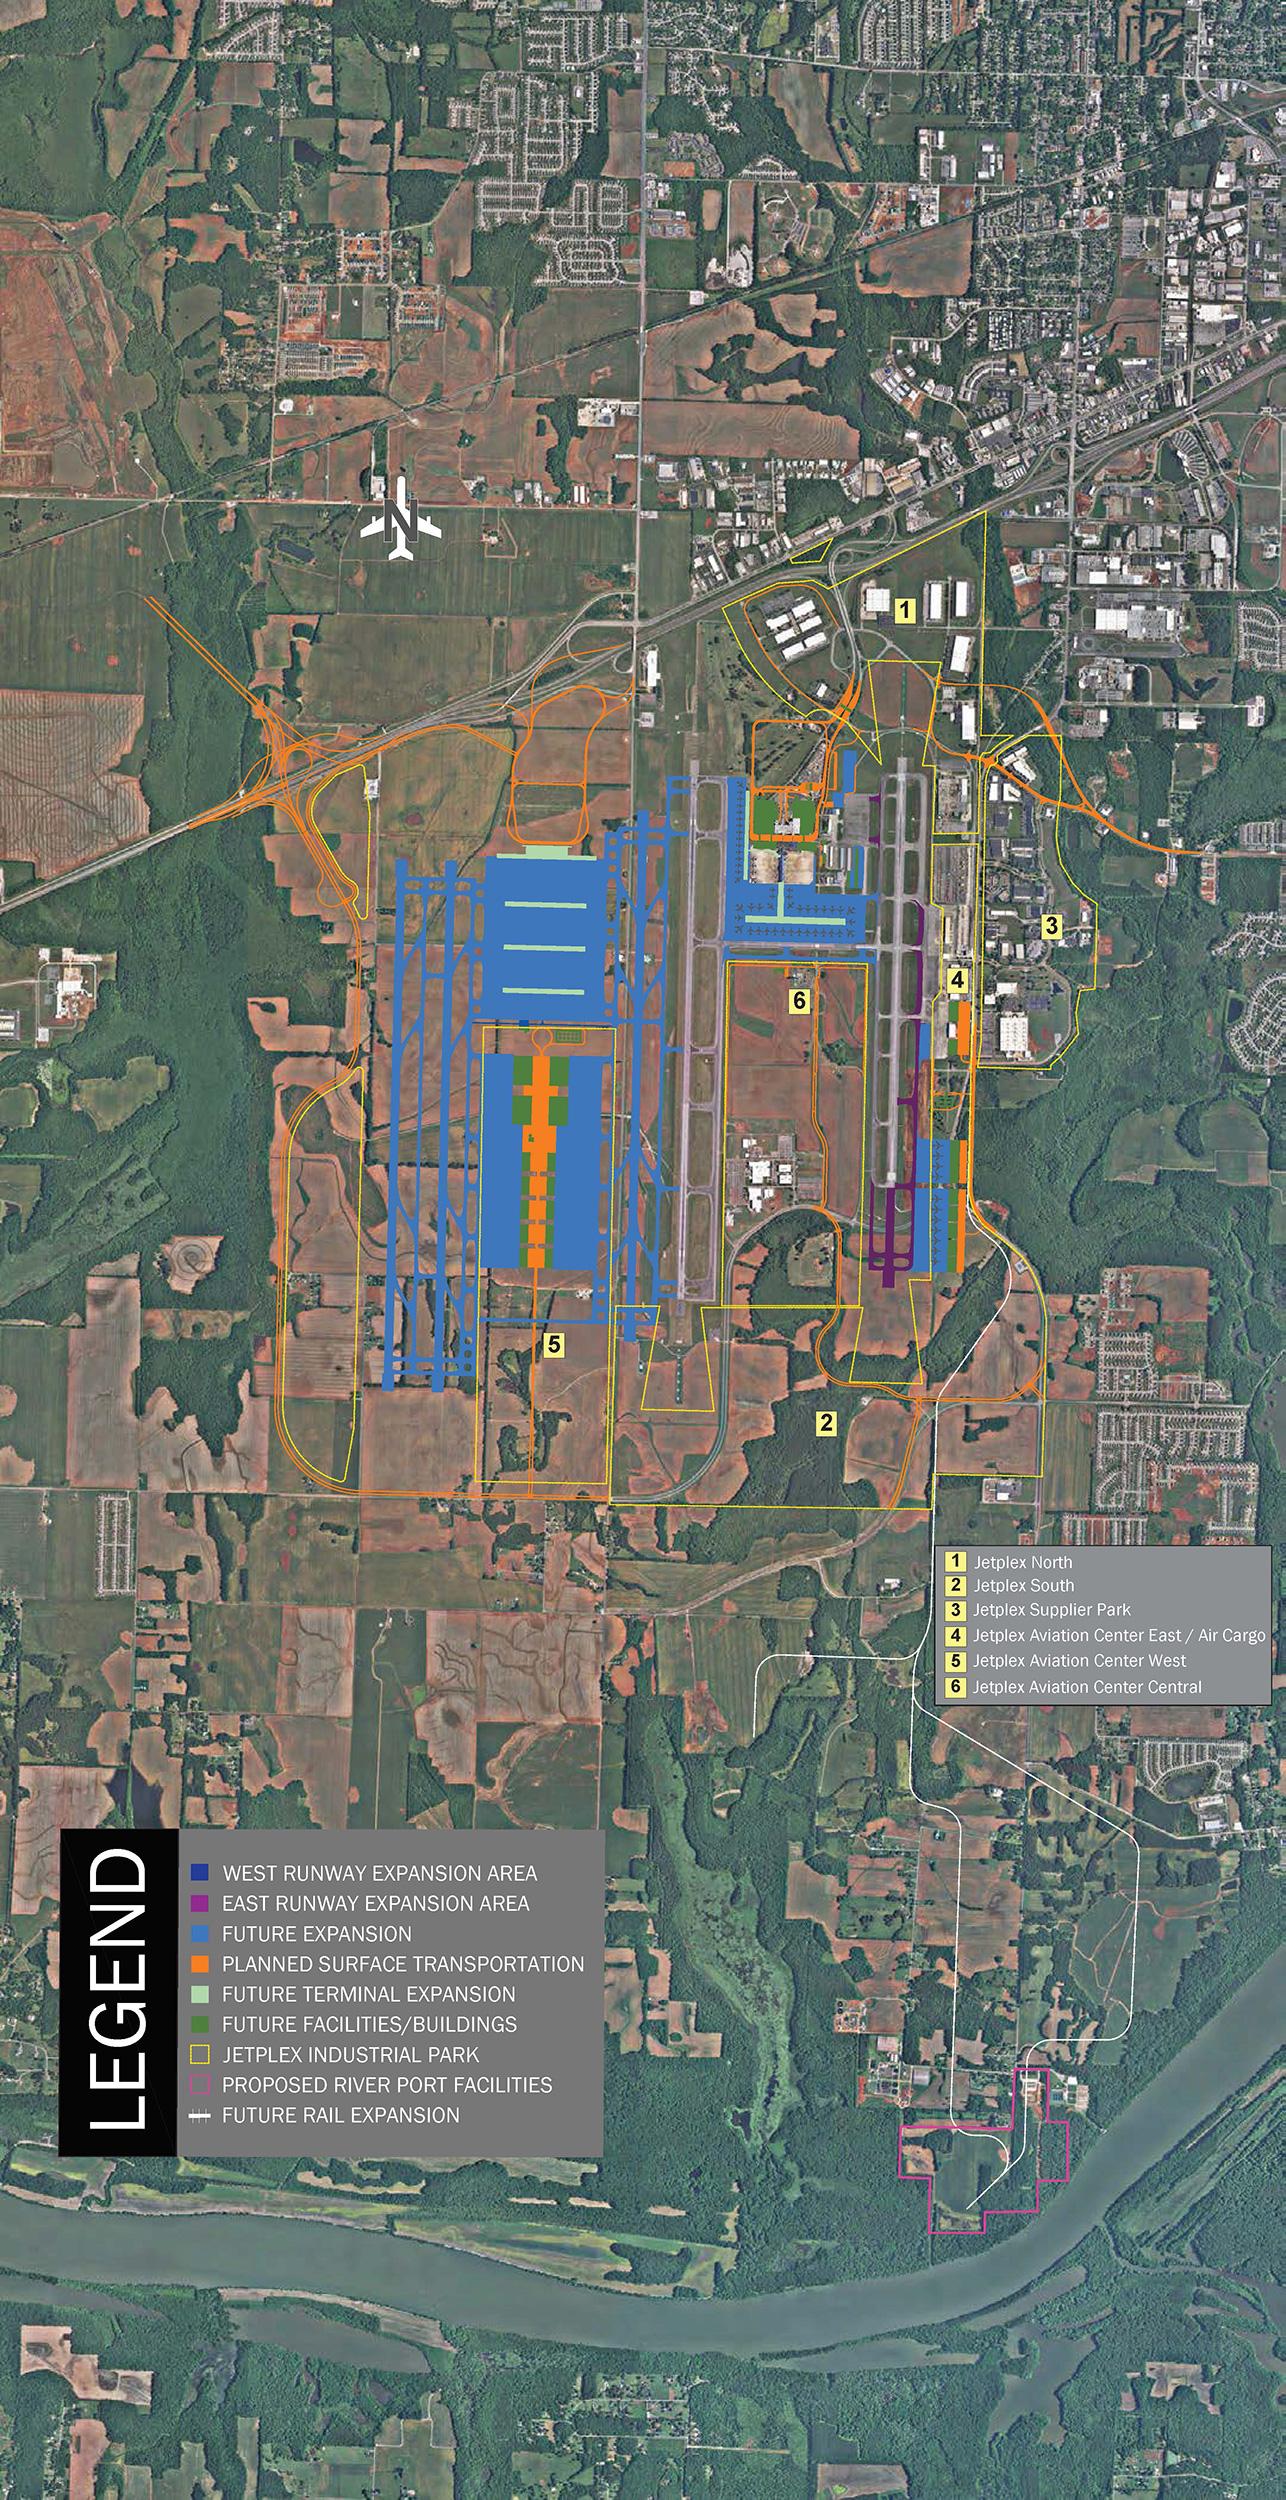 Jetplex Industrial Park Master Plan Map 2020